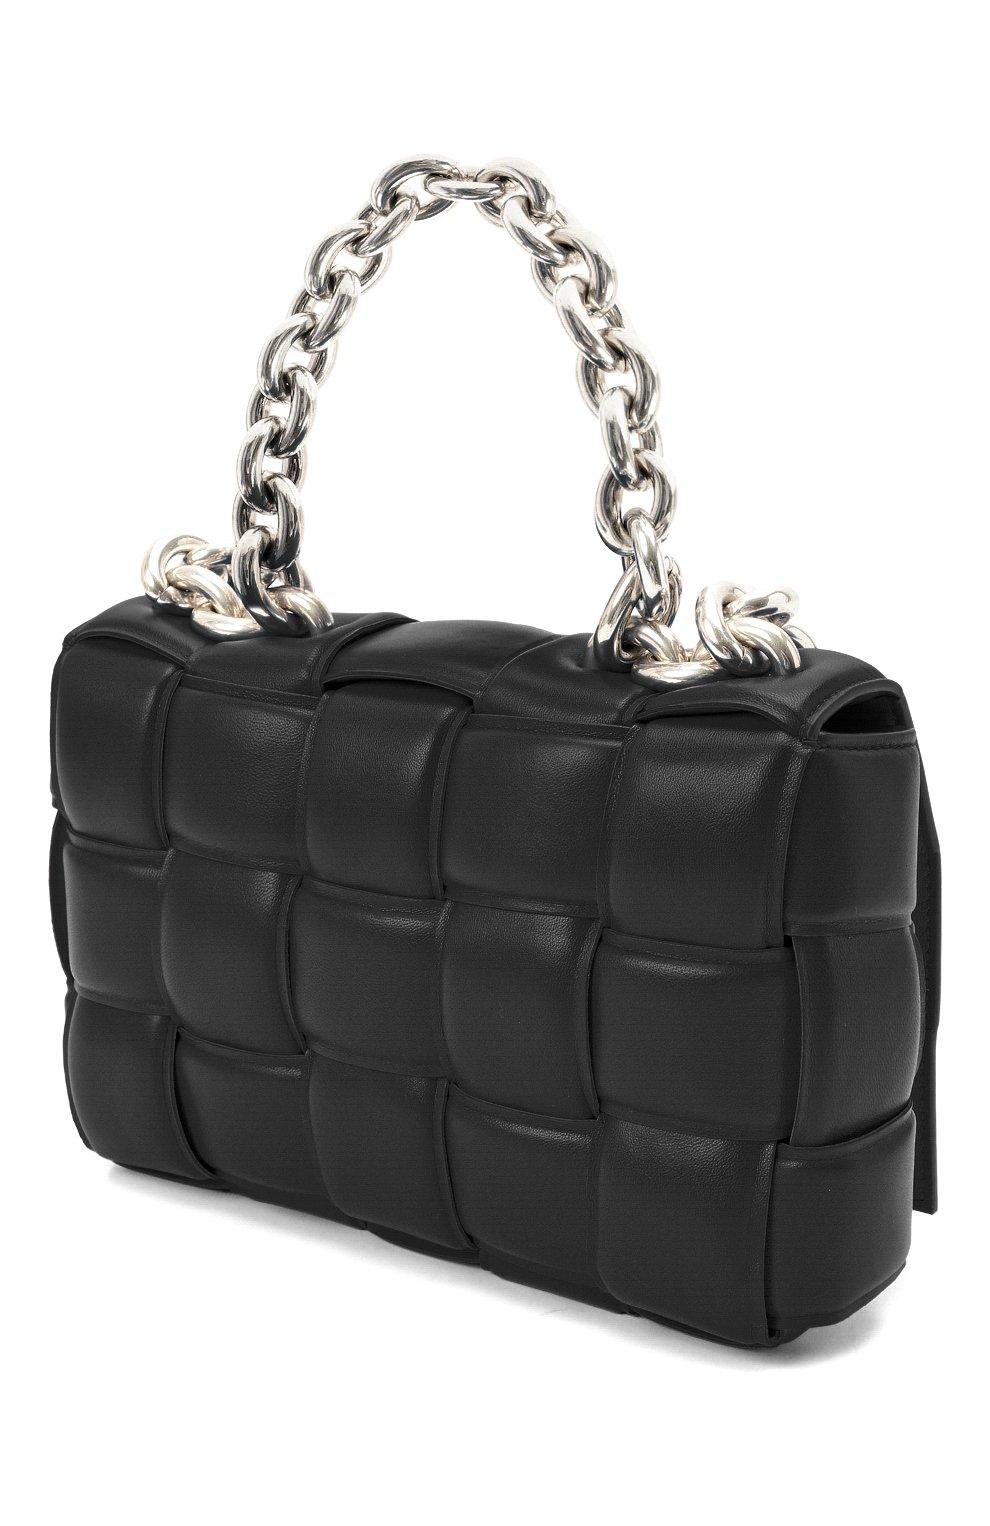 Женская сумка chain cassette BOTTEGA VENETA черного цвета, арт. 631421/VBWZ0 | Фото 3